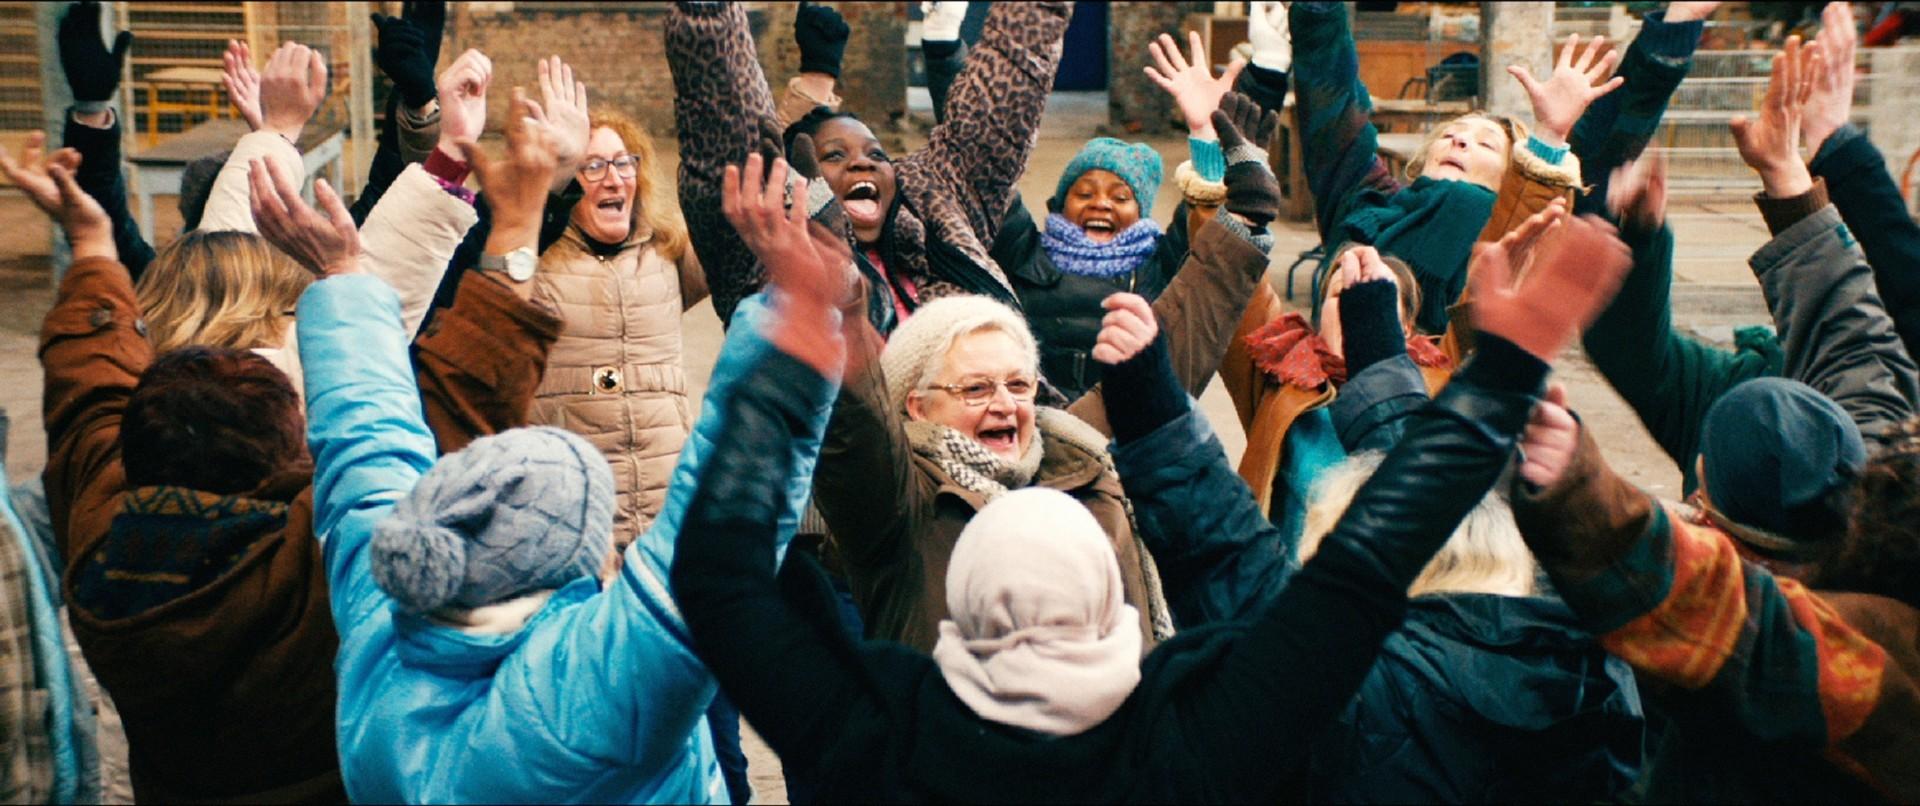 Der Glanz der Unsichtbaren 2 - Filmtipps Oktober